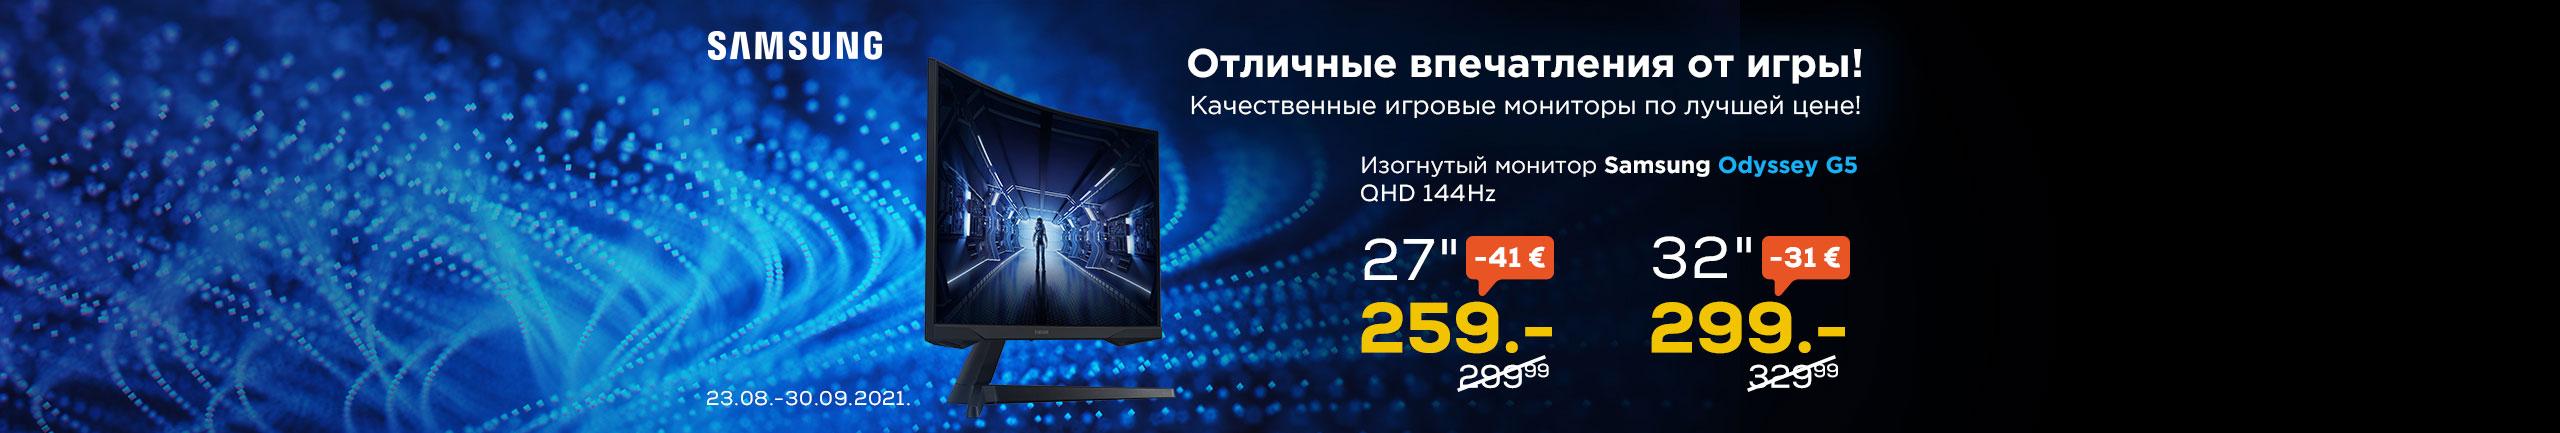 FPS Samsung Odyssey G5